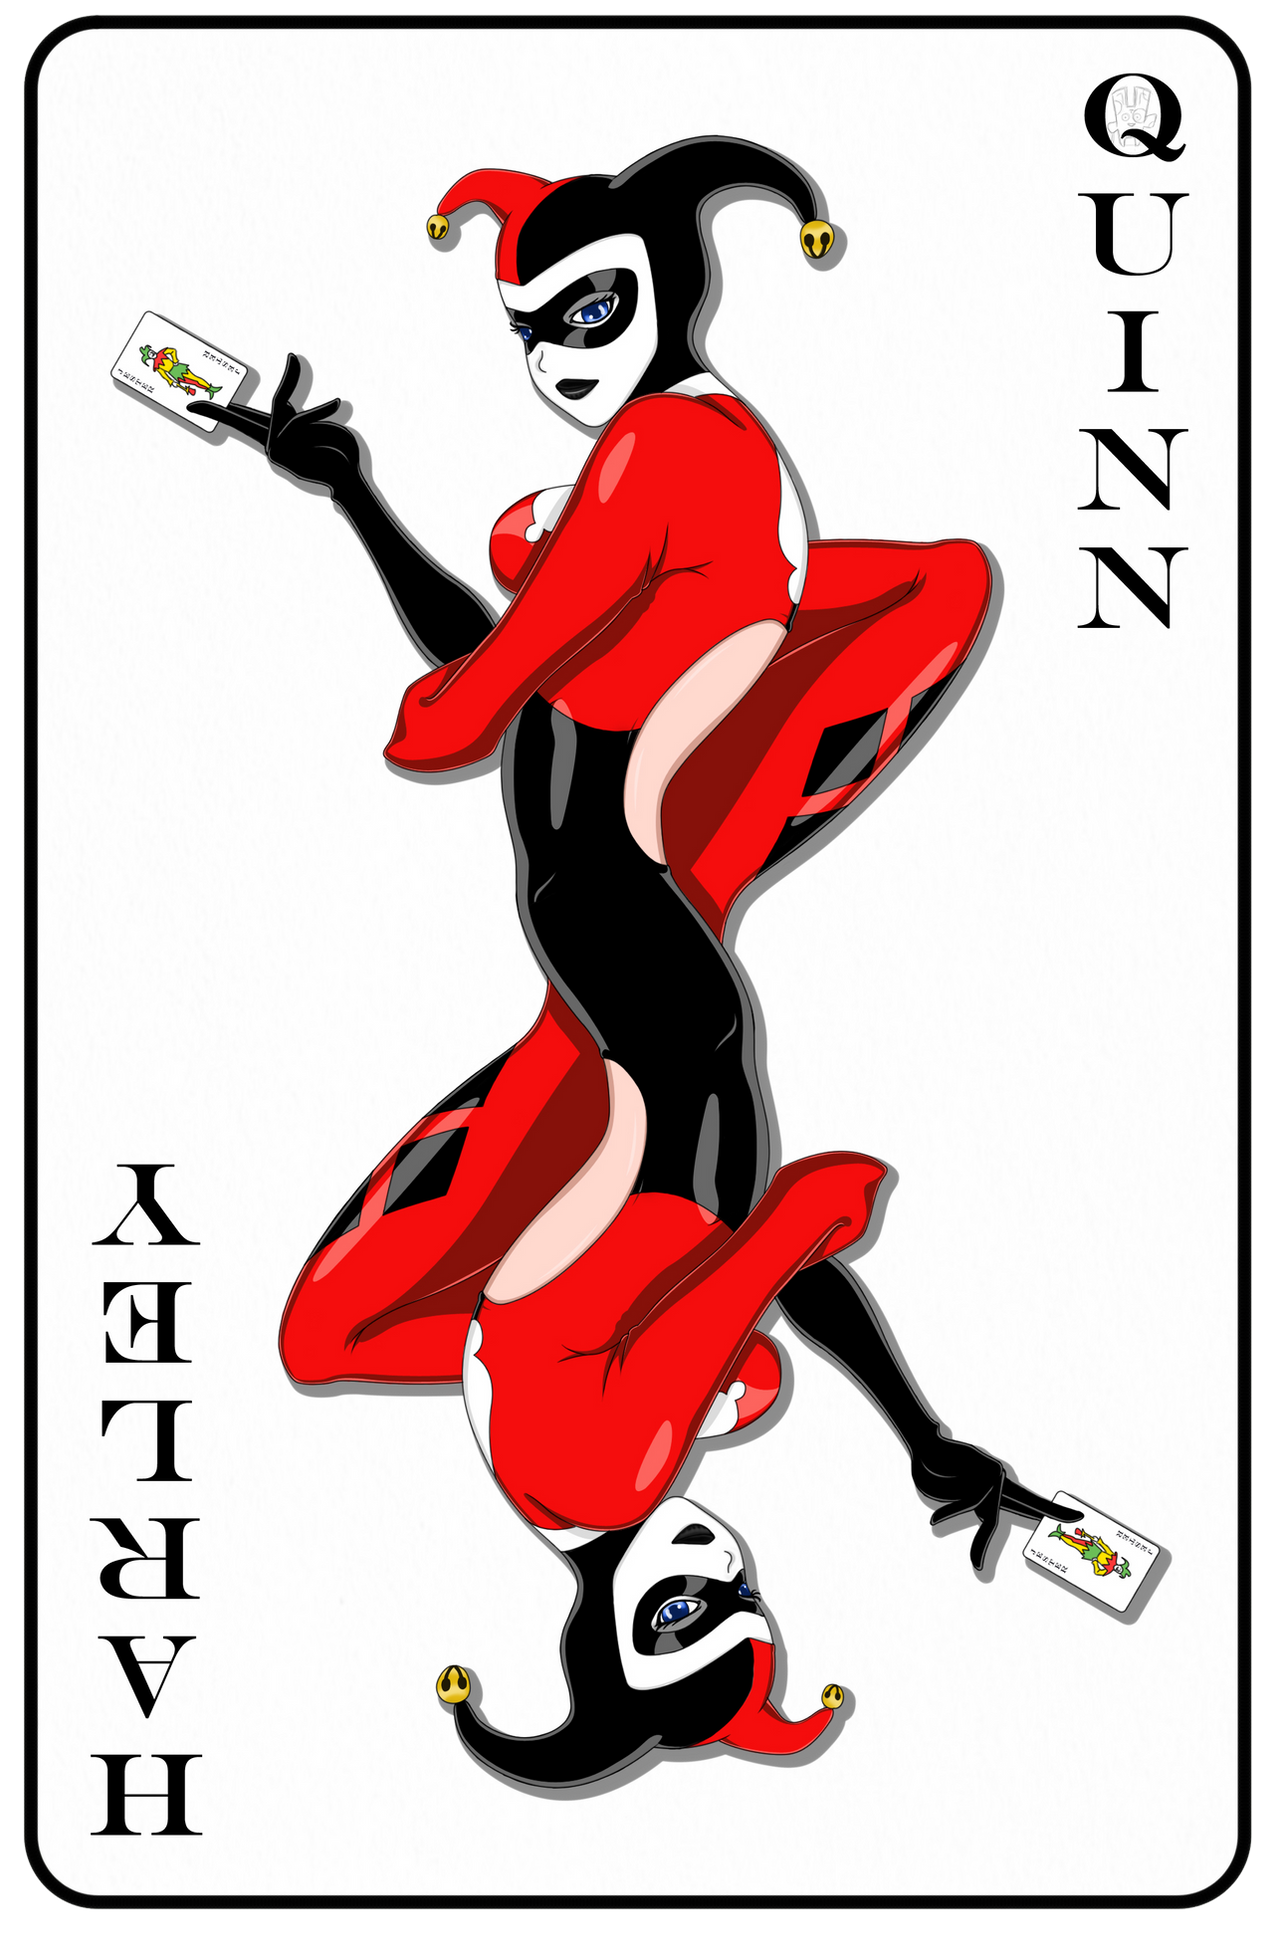 Harley Playing Card by rainboy666 on DeviantArt